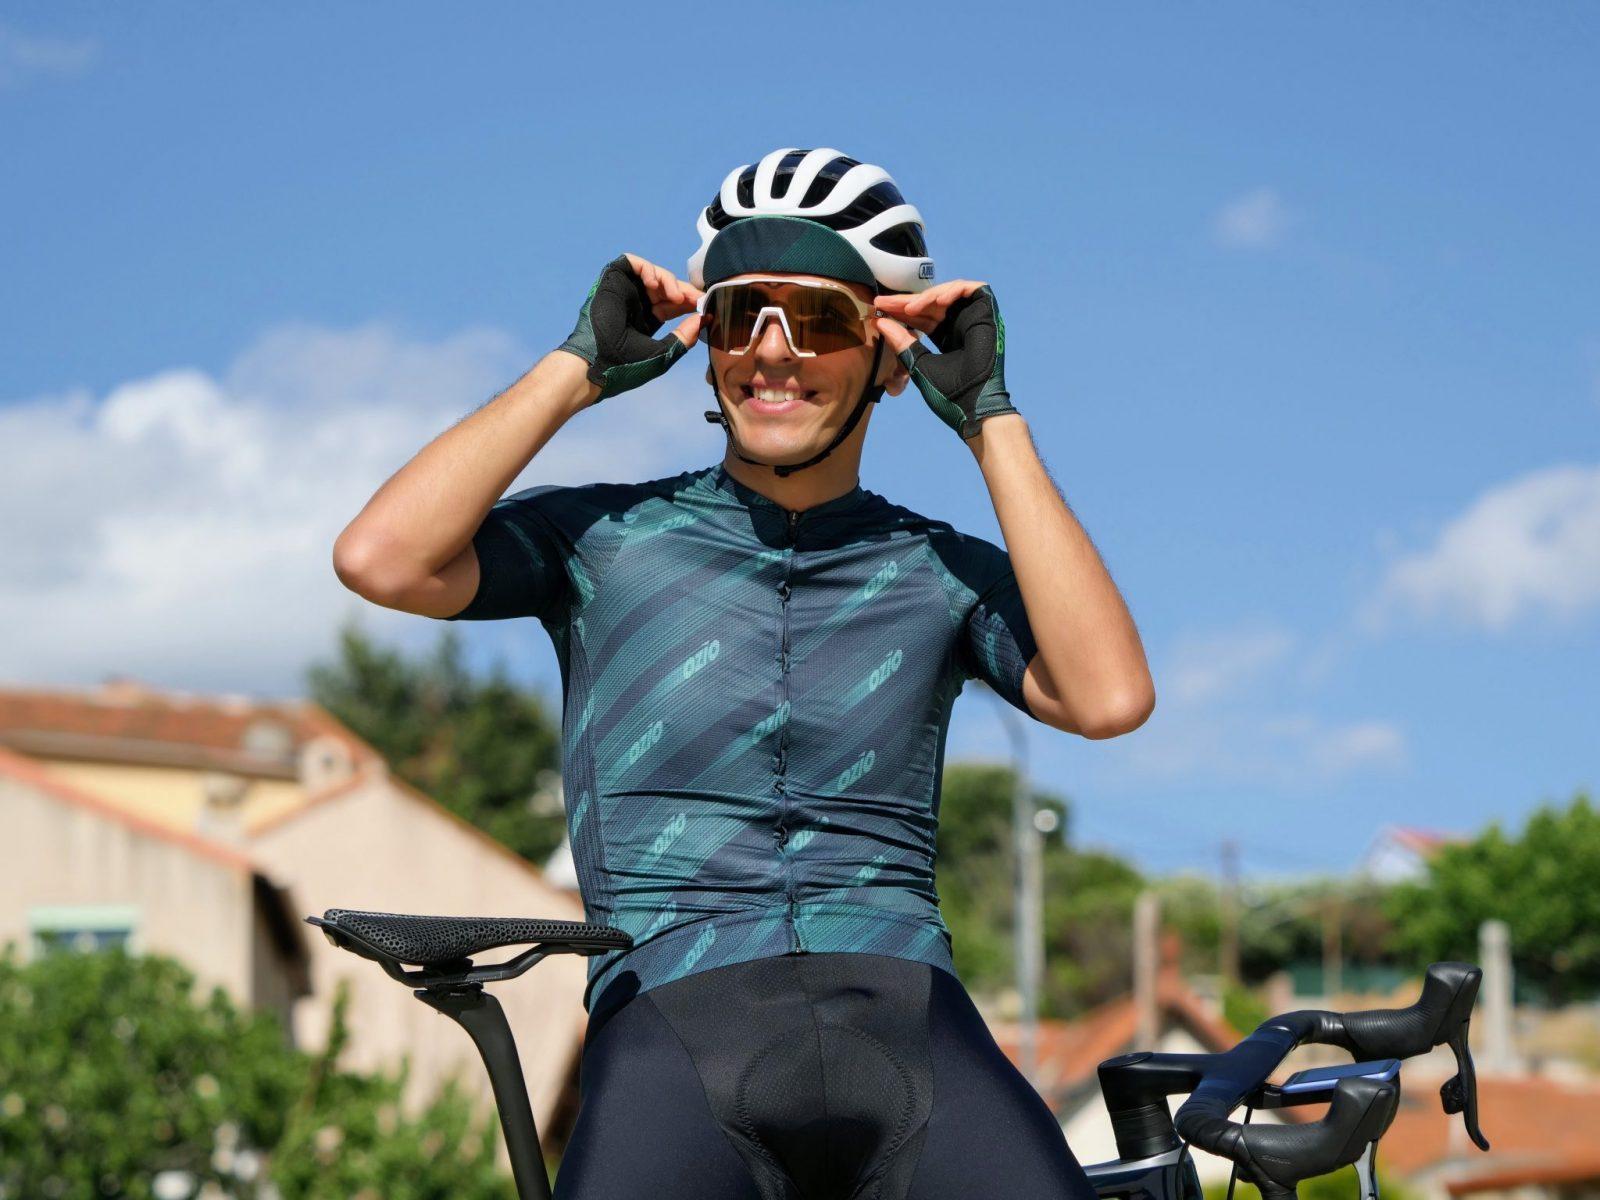 Cycliste casquette verte